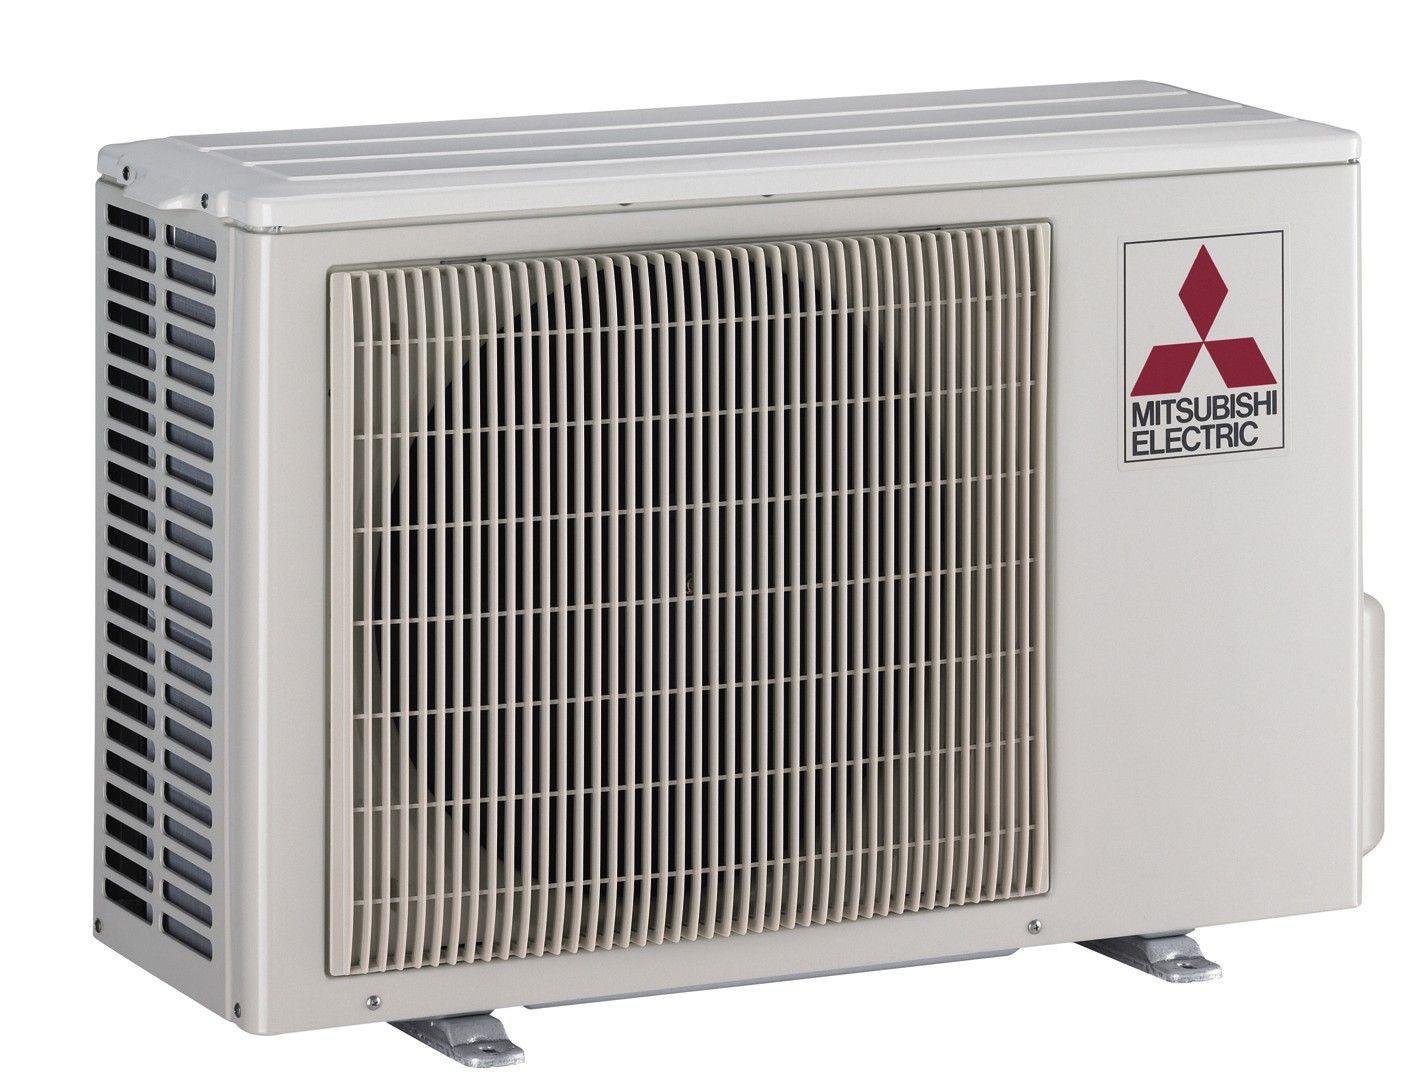 9K BTU 24.6 SEER Mitsubishi MUYGL Air Conditioner Outdoor Unit